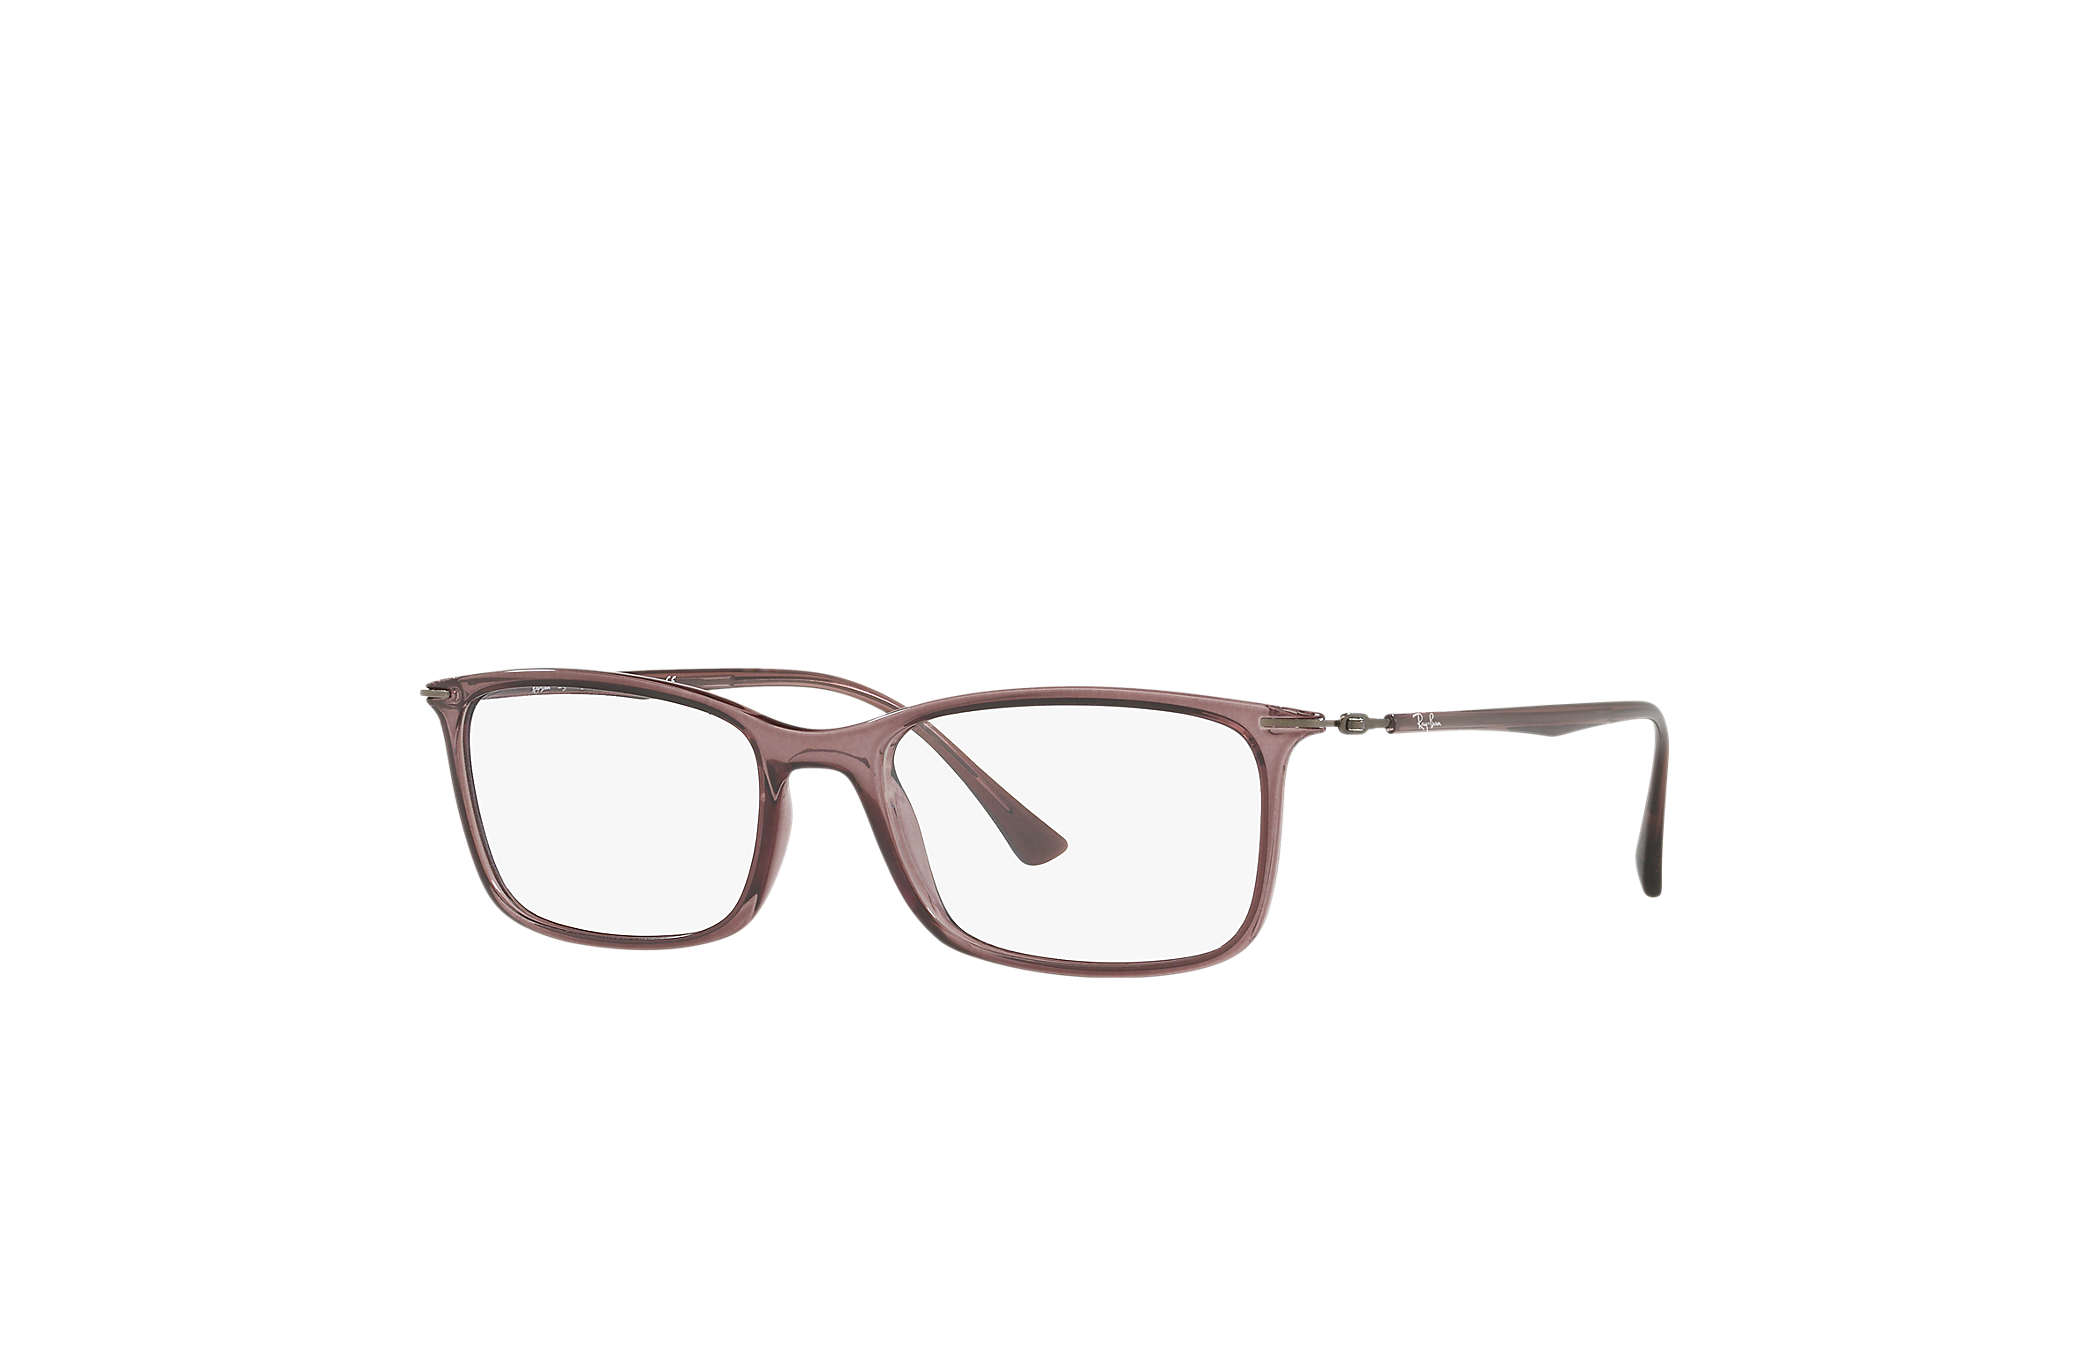 5863e0b527 Ray-Ban prescription glasses RB7031 Violet - Nylon - 0RX7031574053 ...